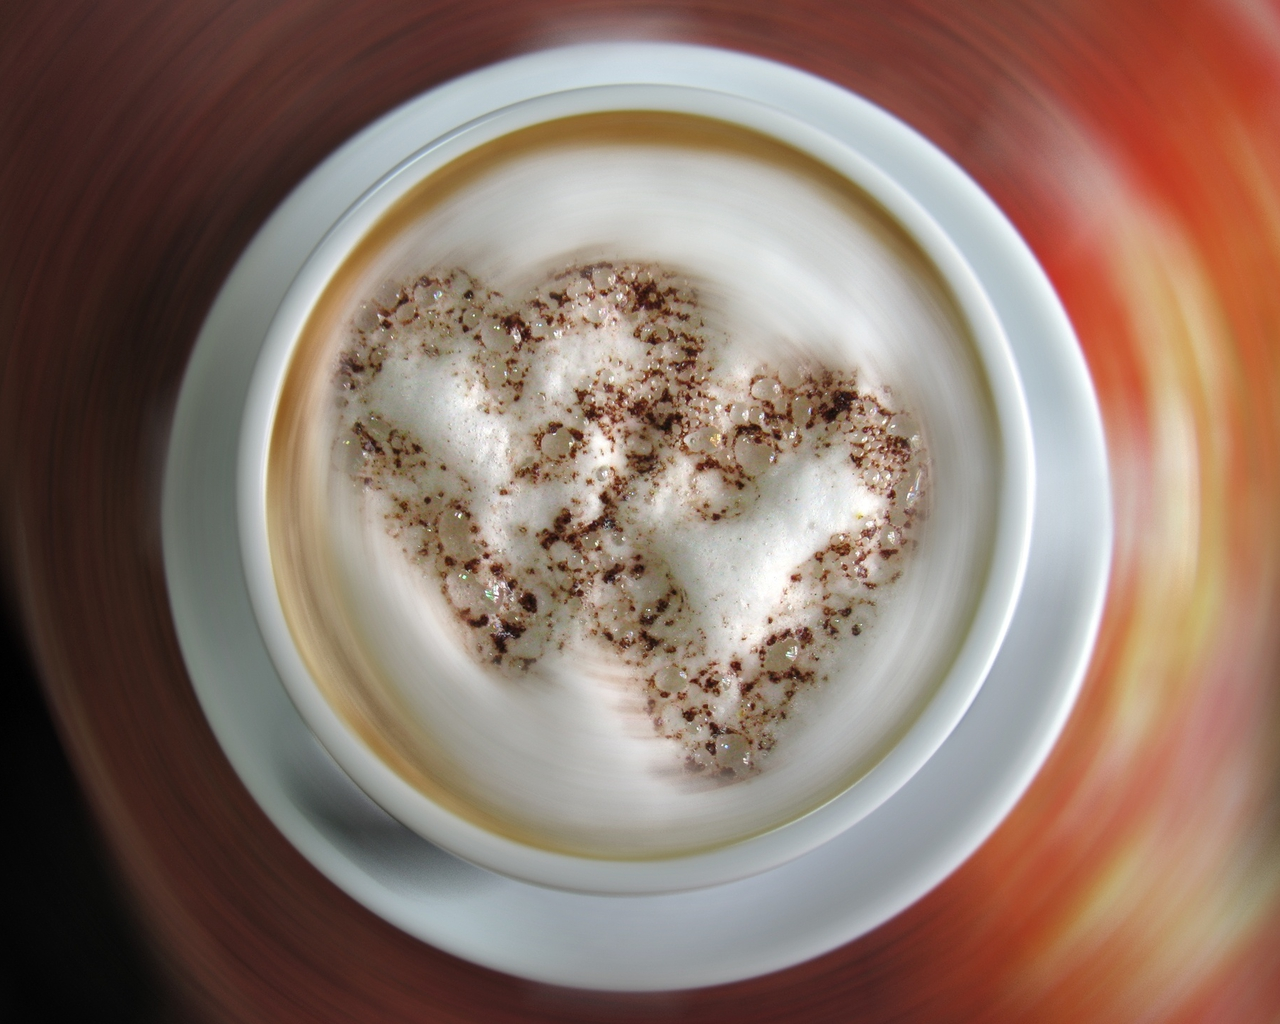 Coffee Wallpaper (25055431)